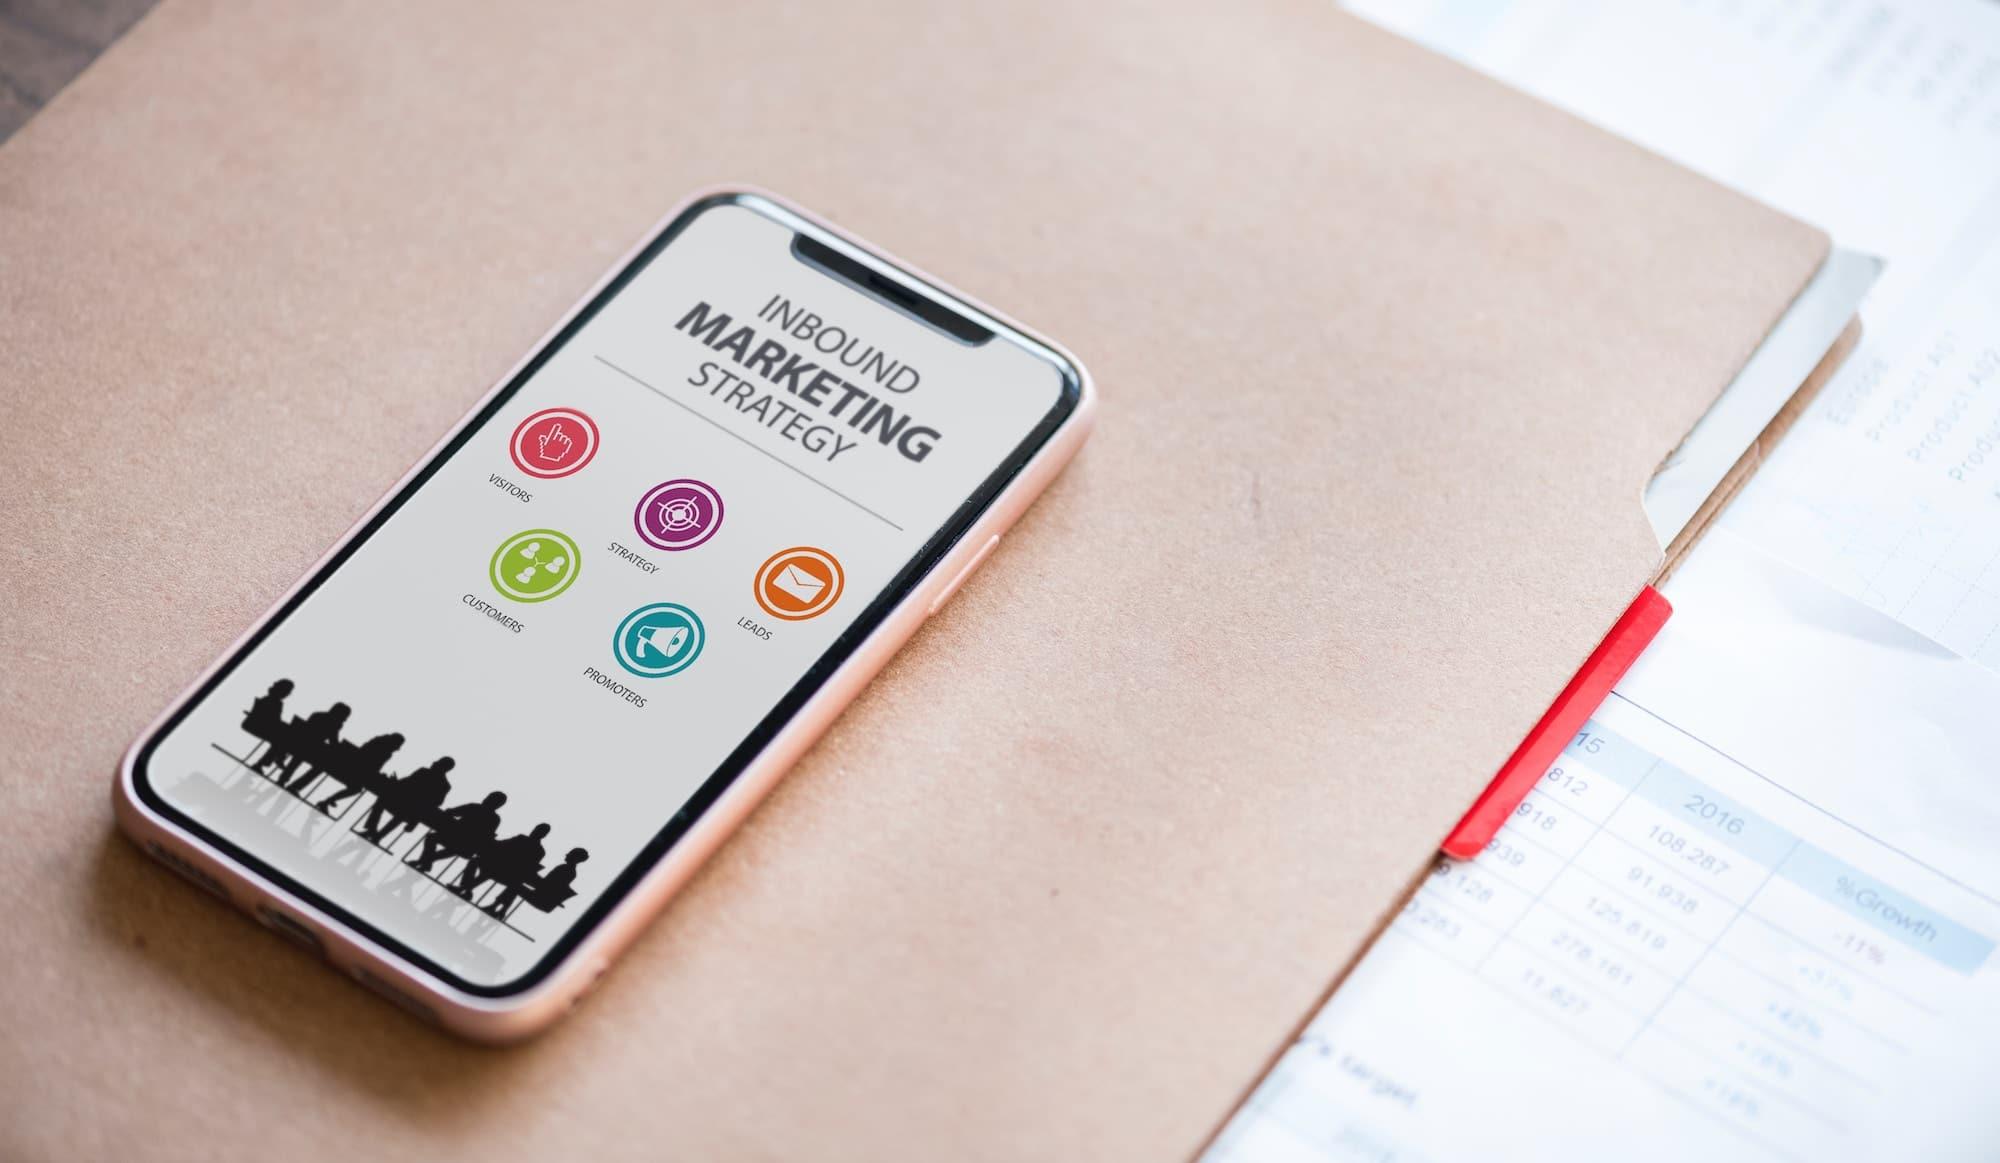 Indbound marketing strategy